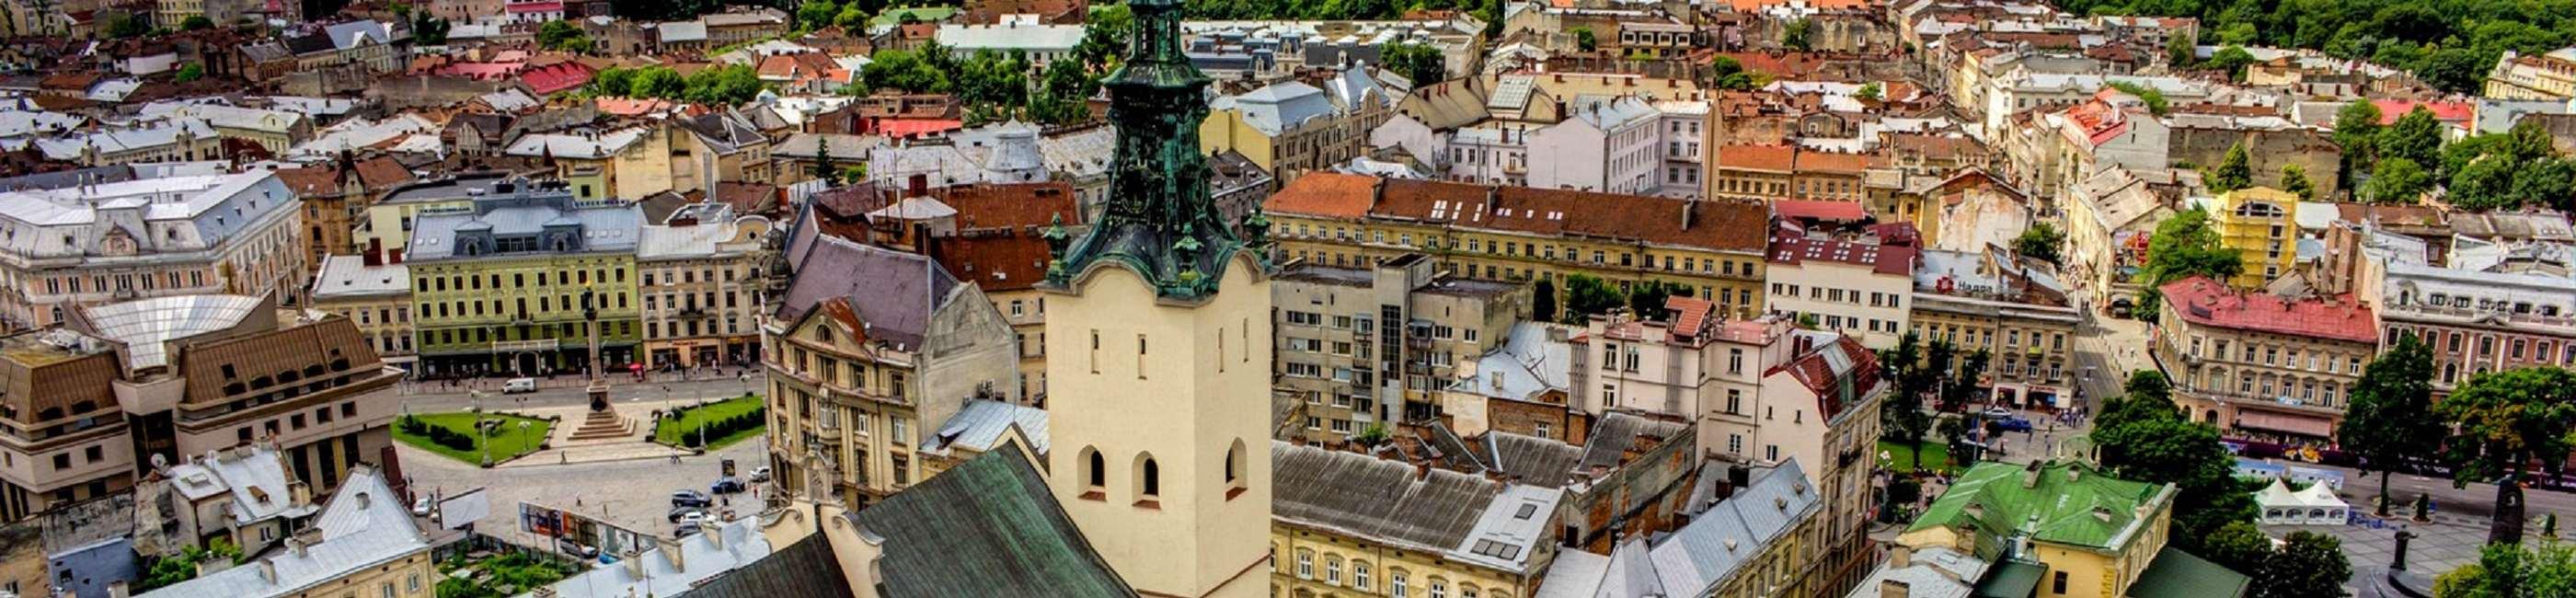 tour itinerary - Impressionnant Ukraine!